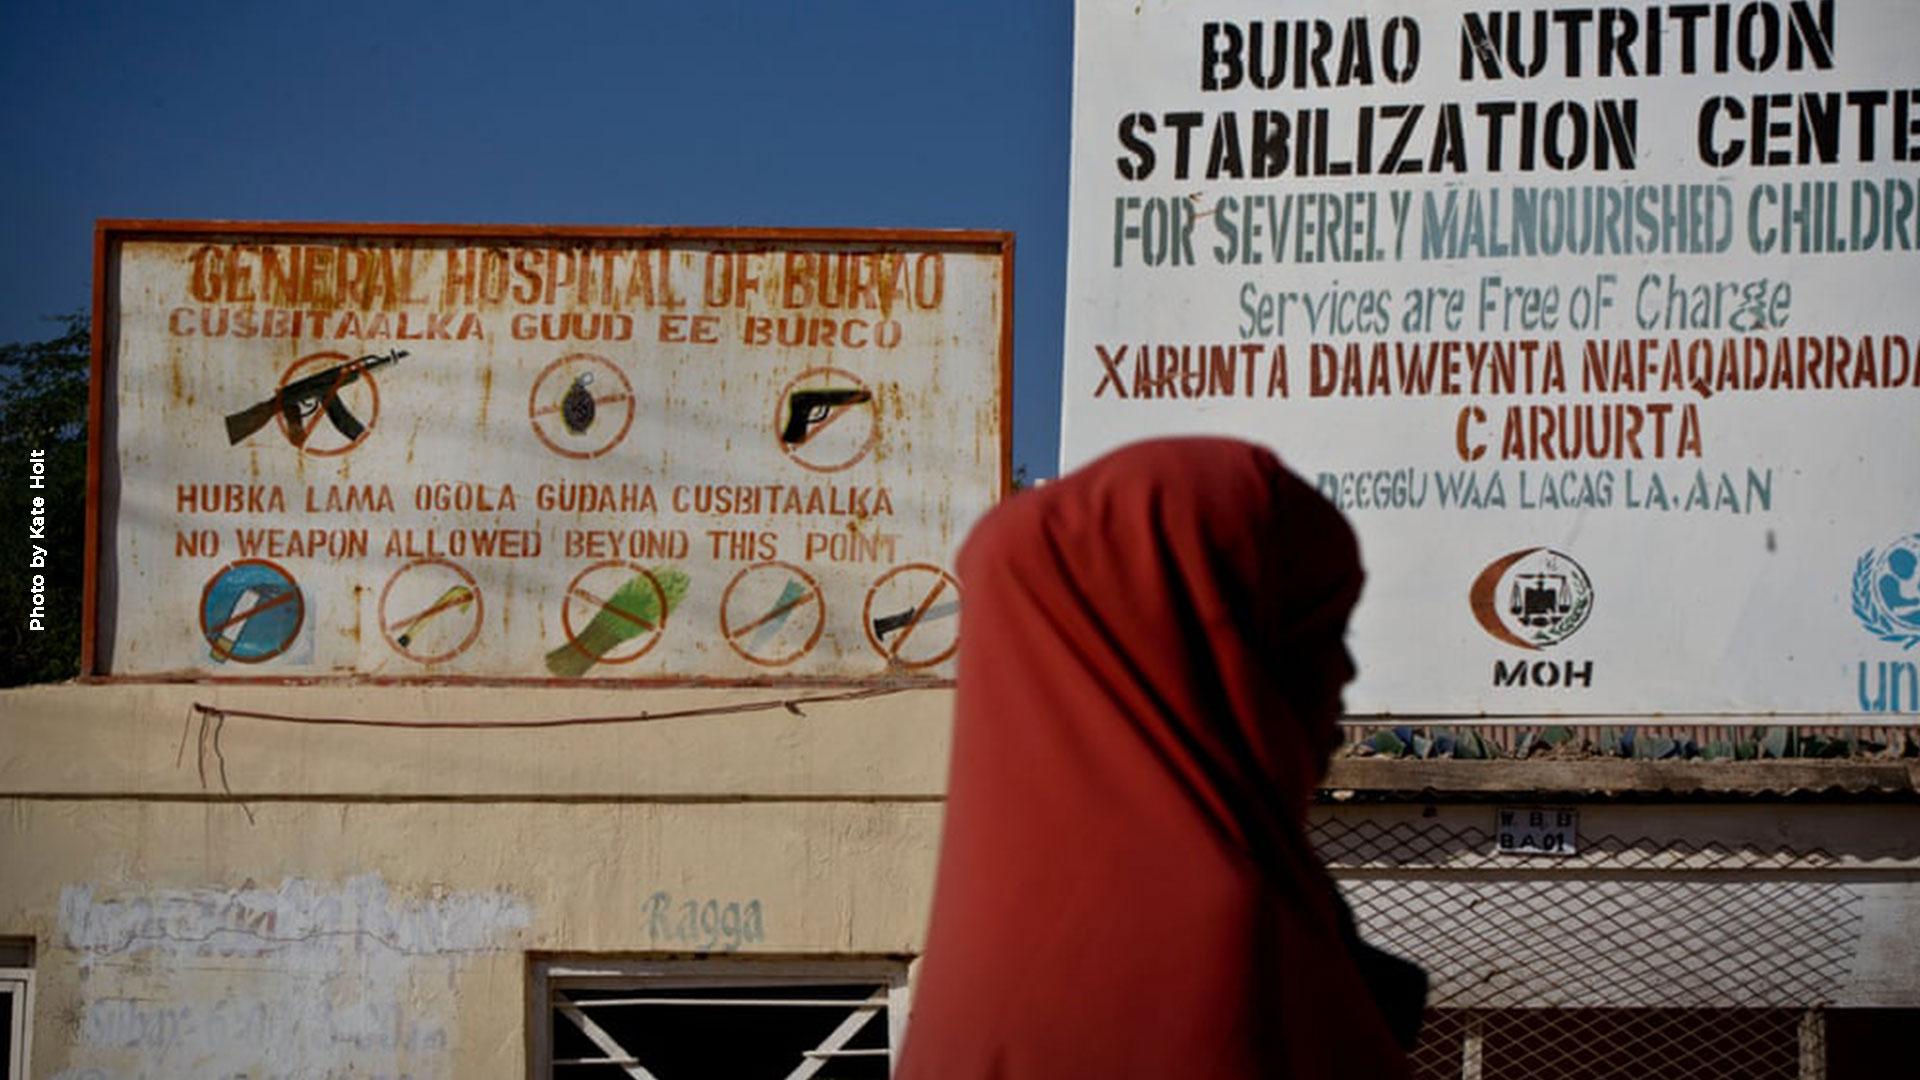 Burao Somalia